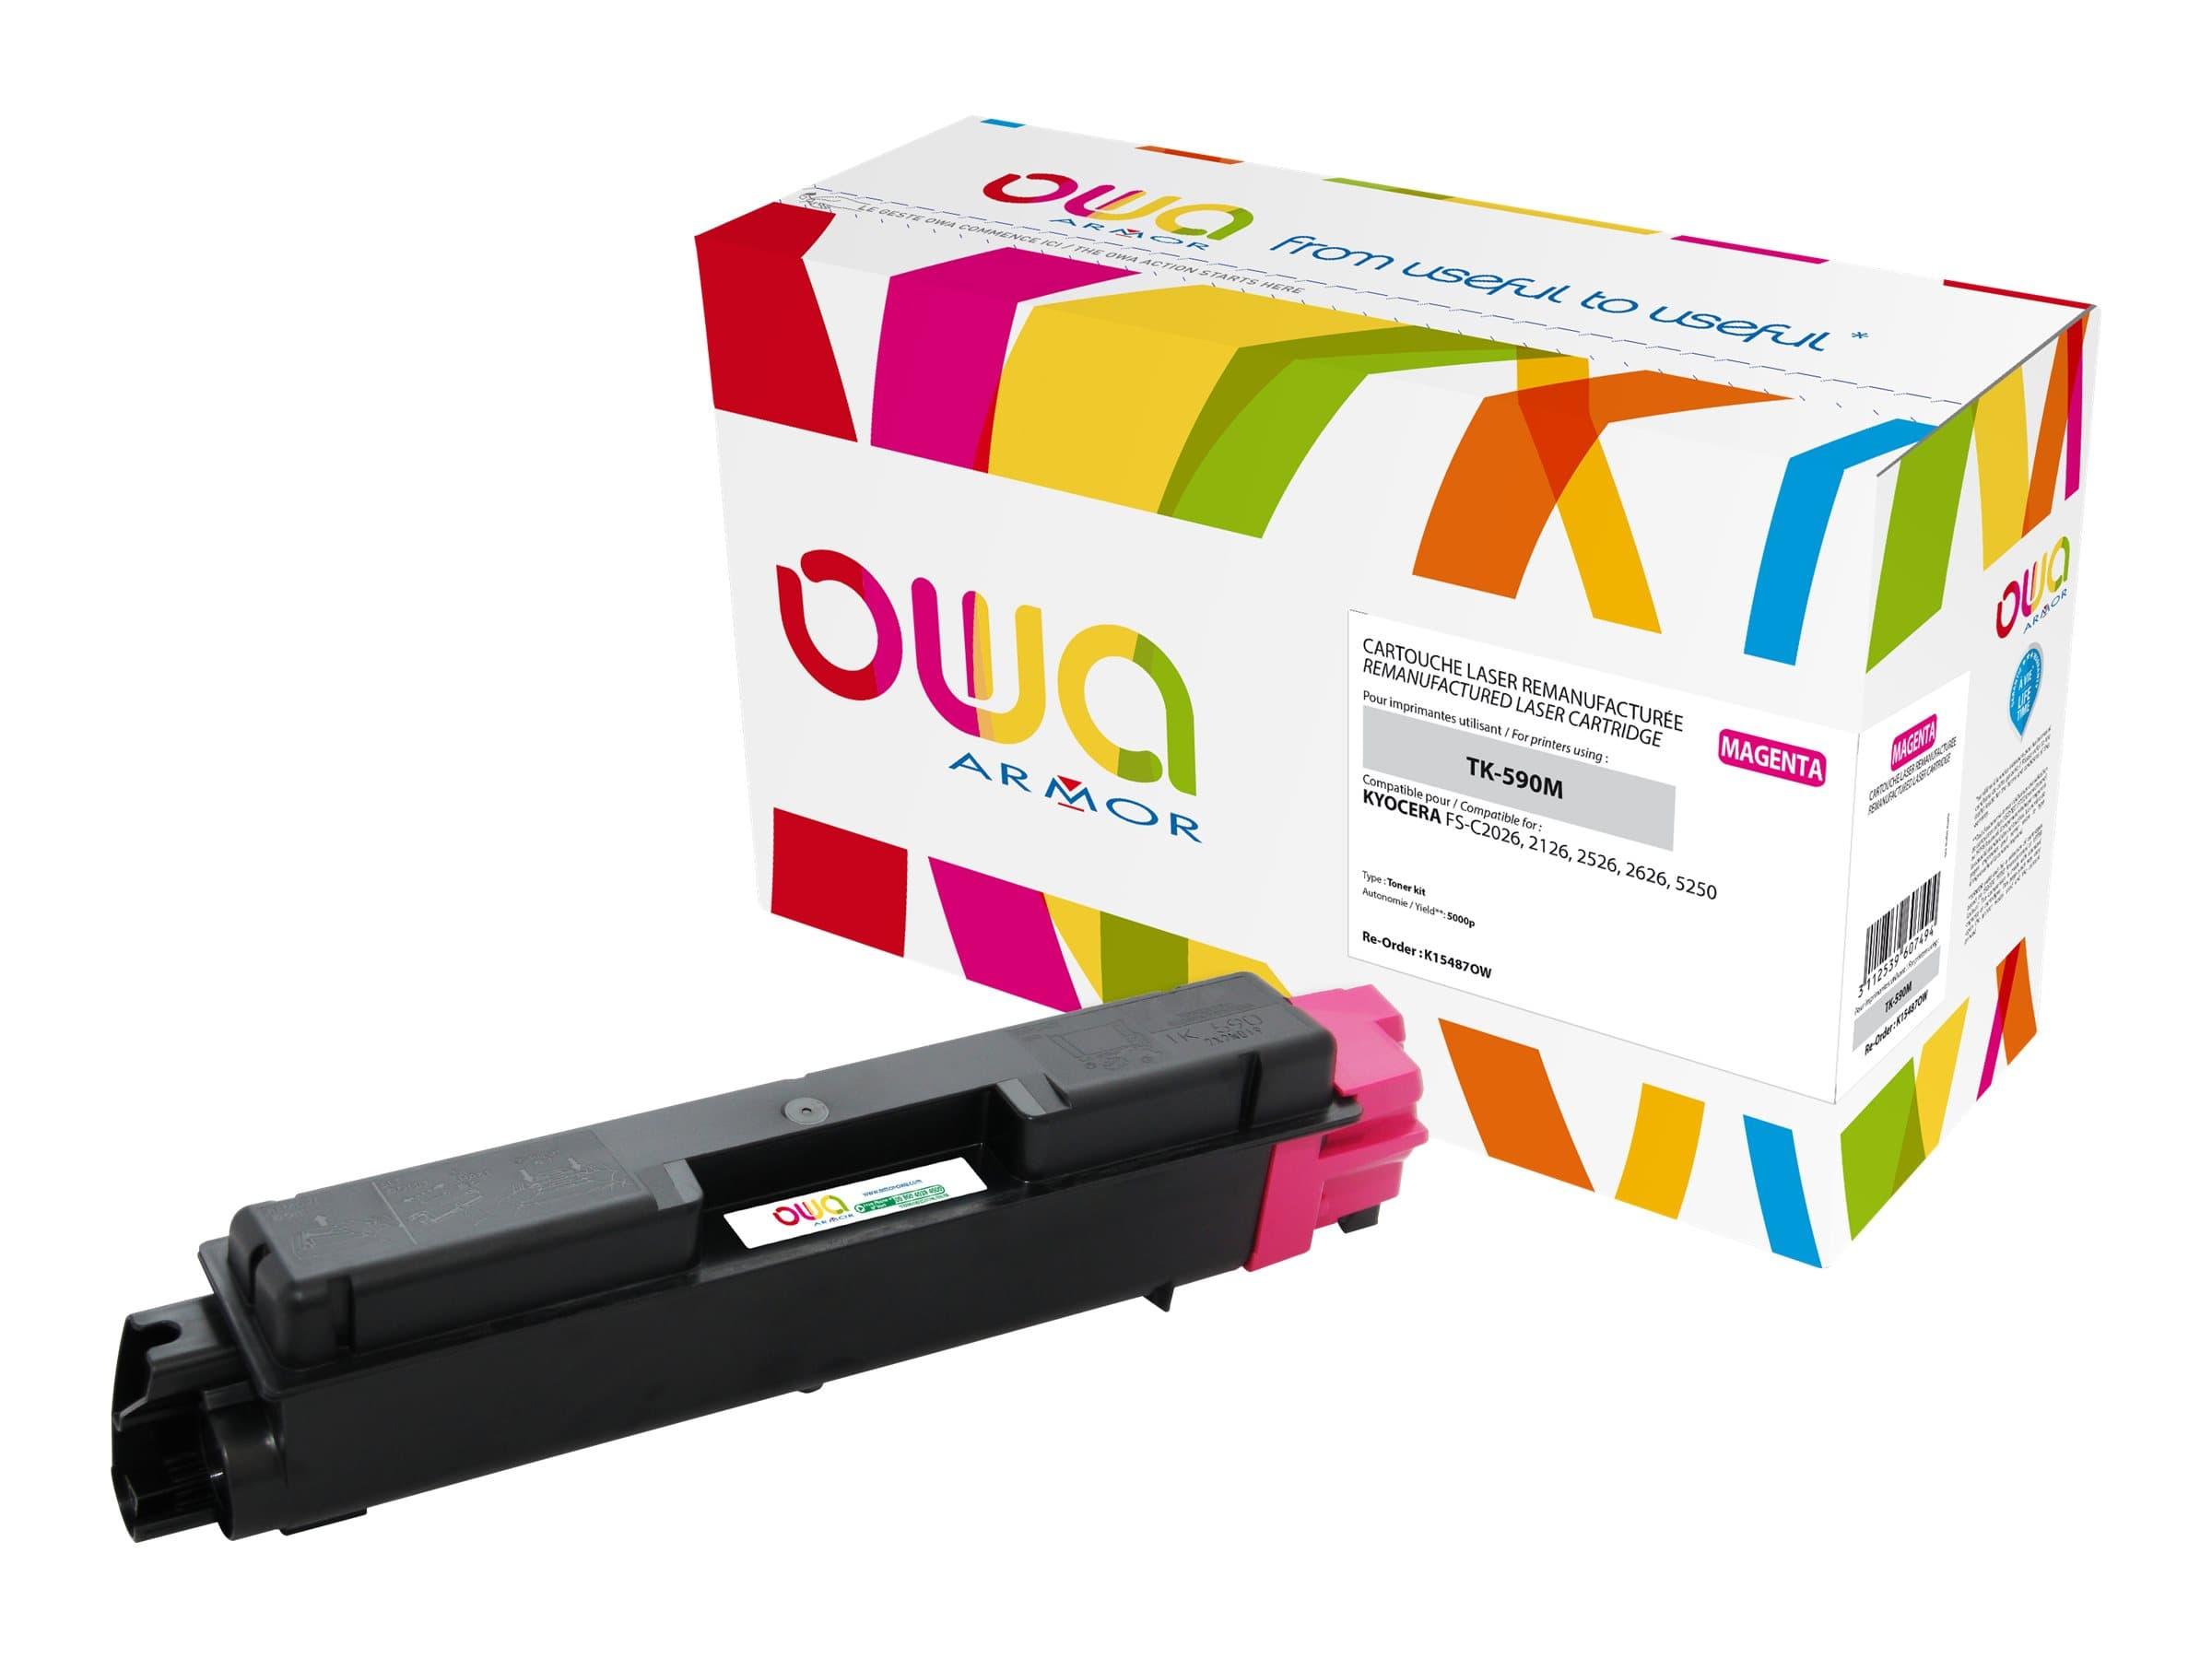 Kyocera TK-590 - remanufacturé Owa K15487OW - magenta - cartouche laser